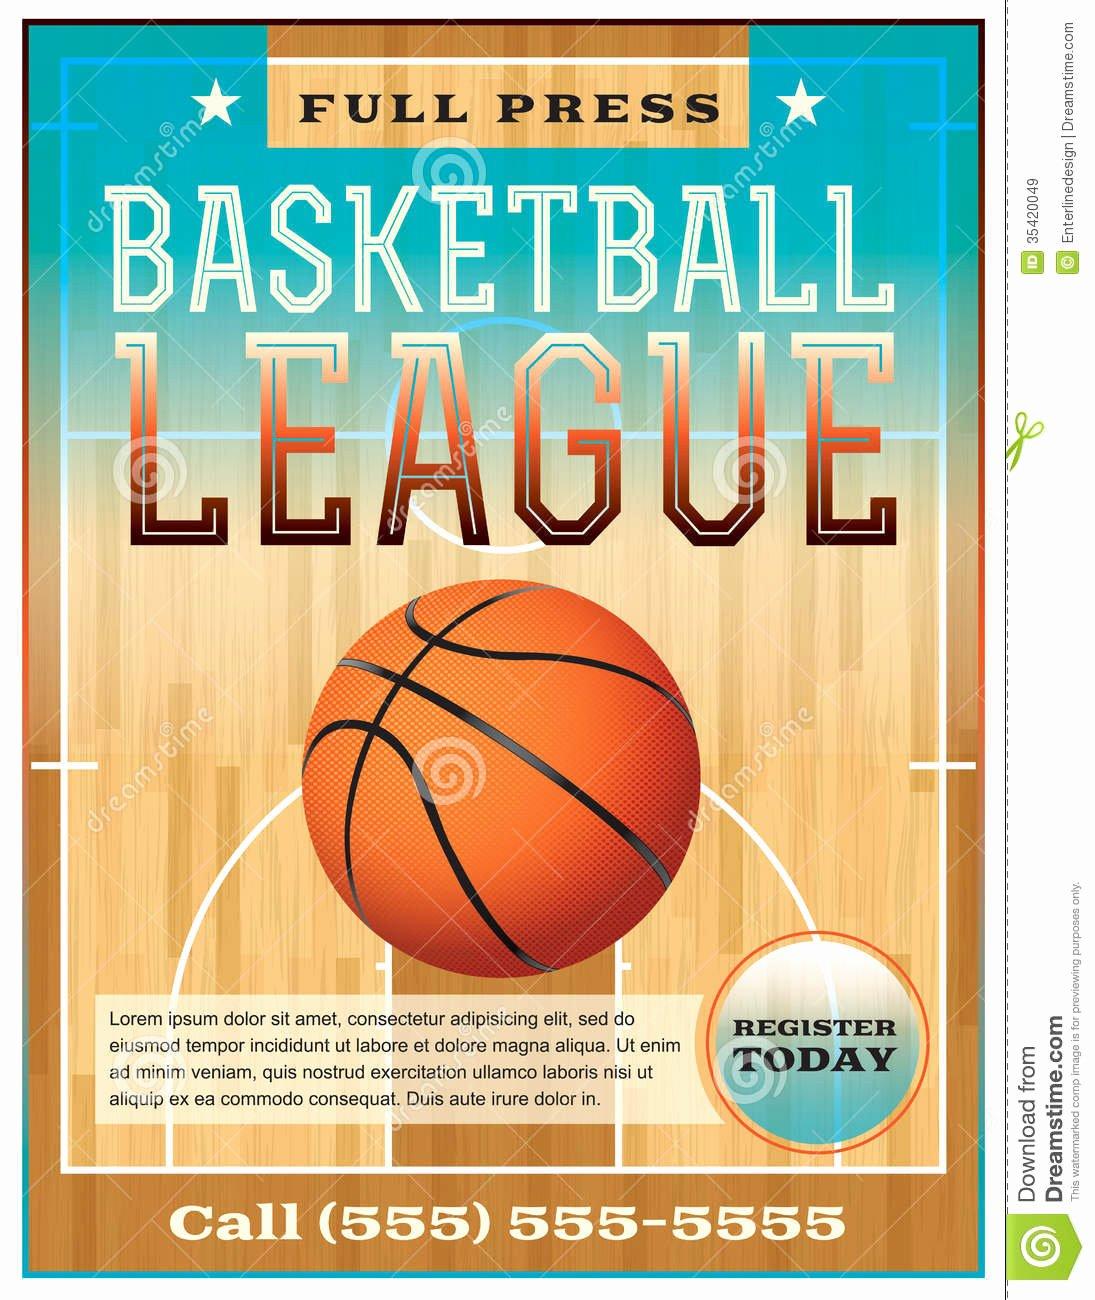 Basketball Camp Flyer Template Luxury Basketball League Flyer Stock Vector Illustration Of